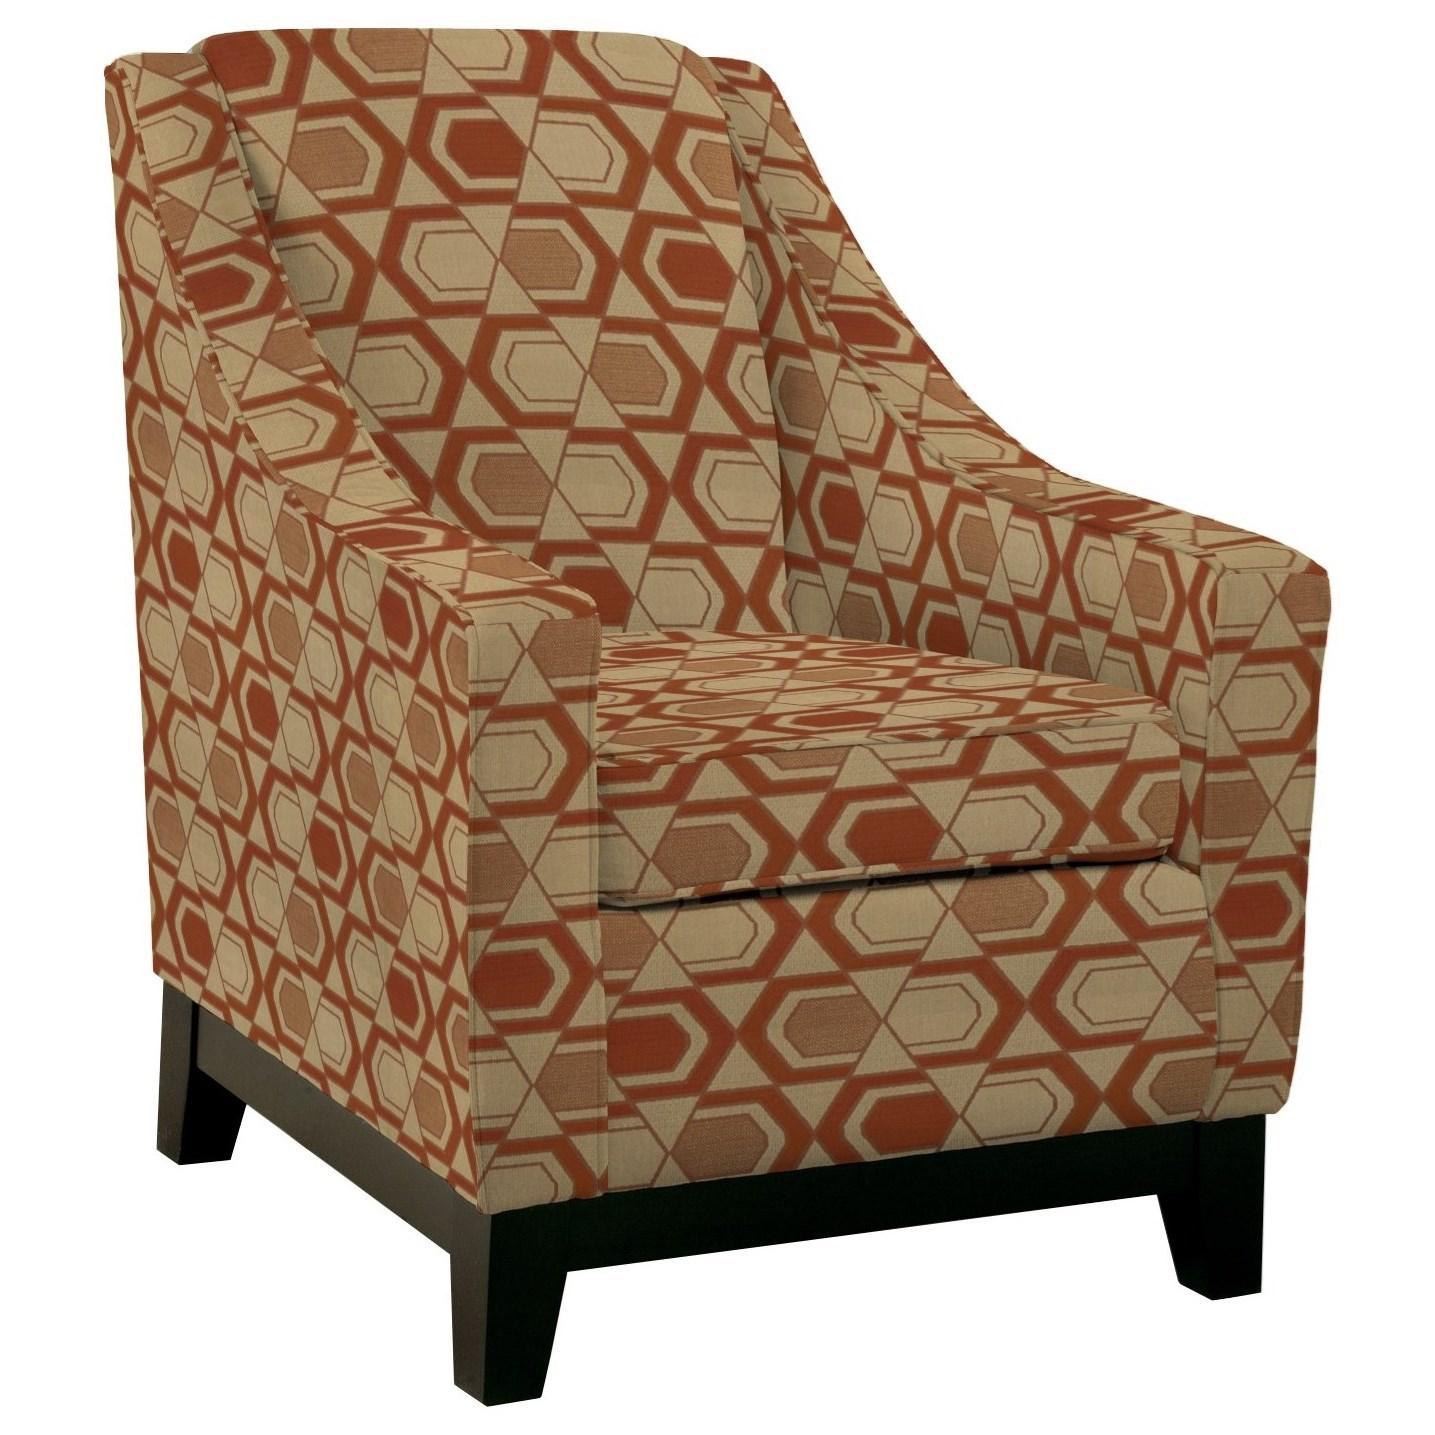 Club Chairs Mariko Club Chair by Best Home Furnishings at Lucas Furniture & Mattress